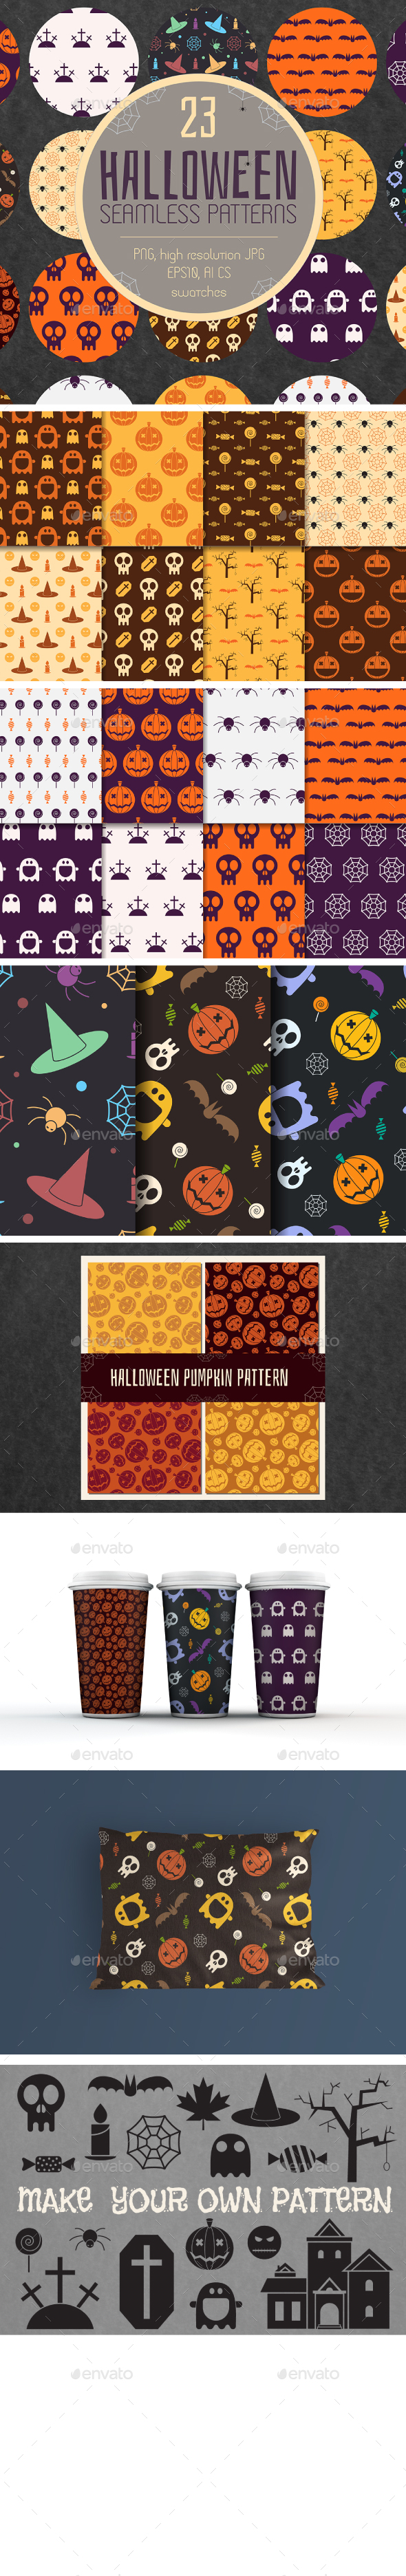 23 Halloween Seamless Patterns Pack